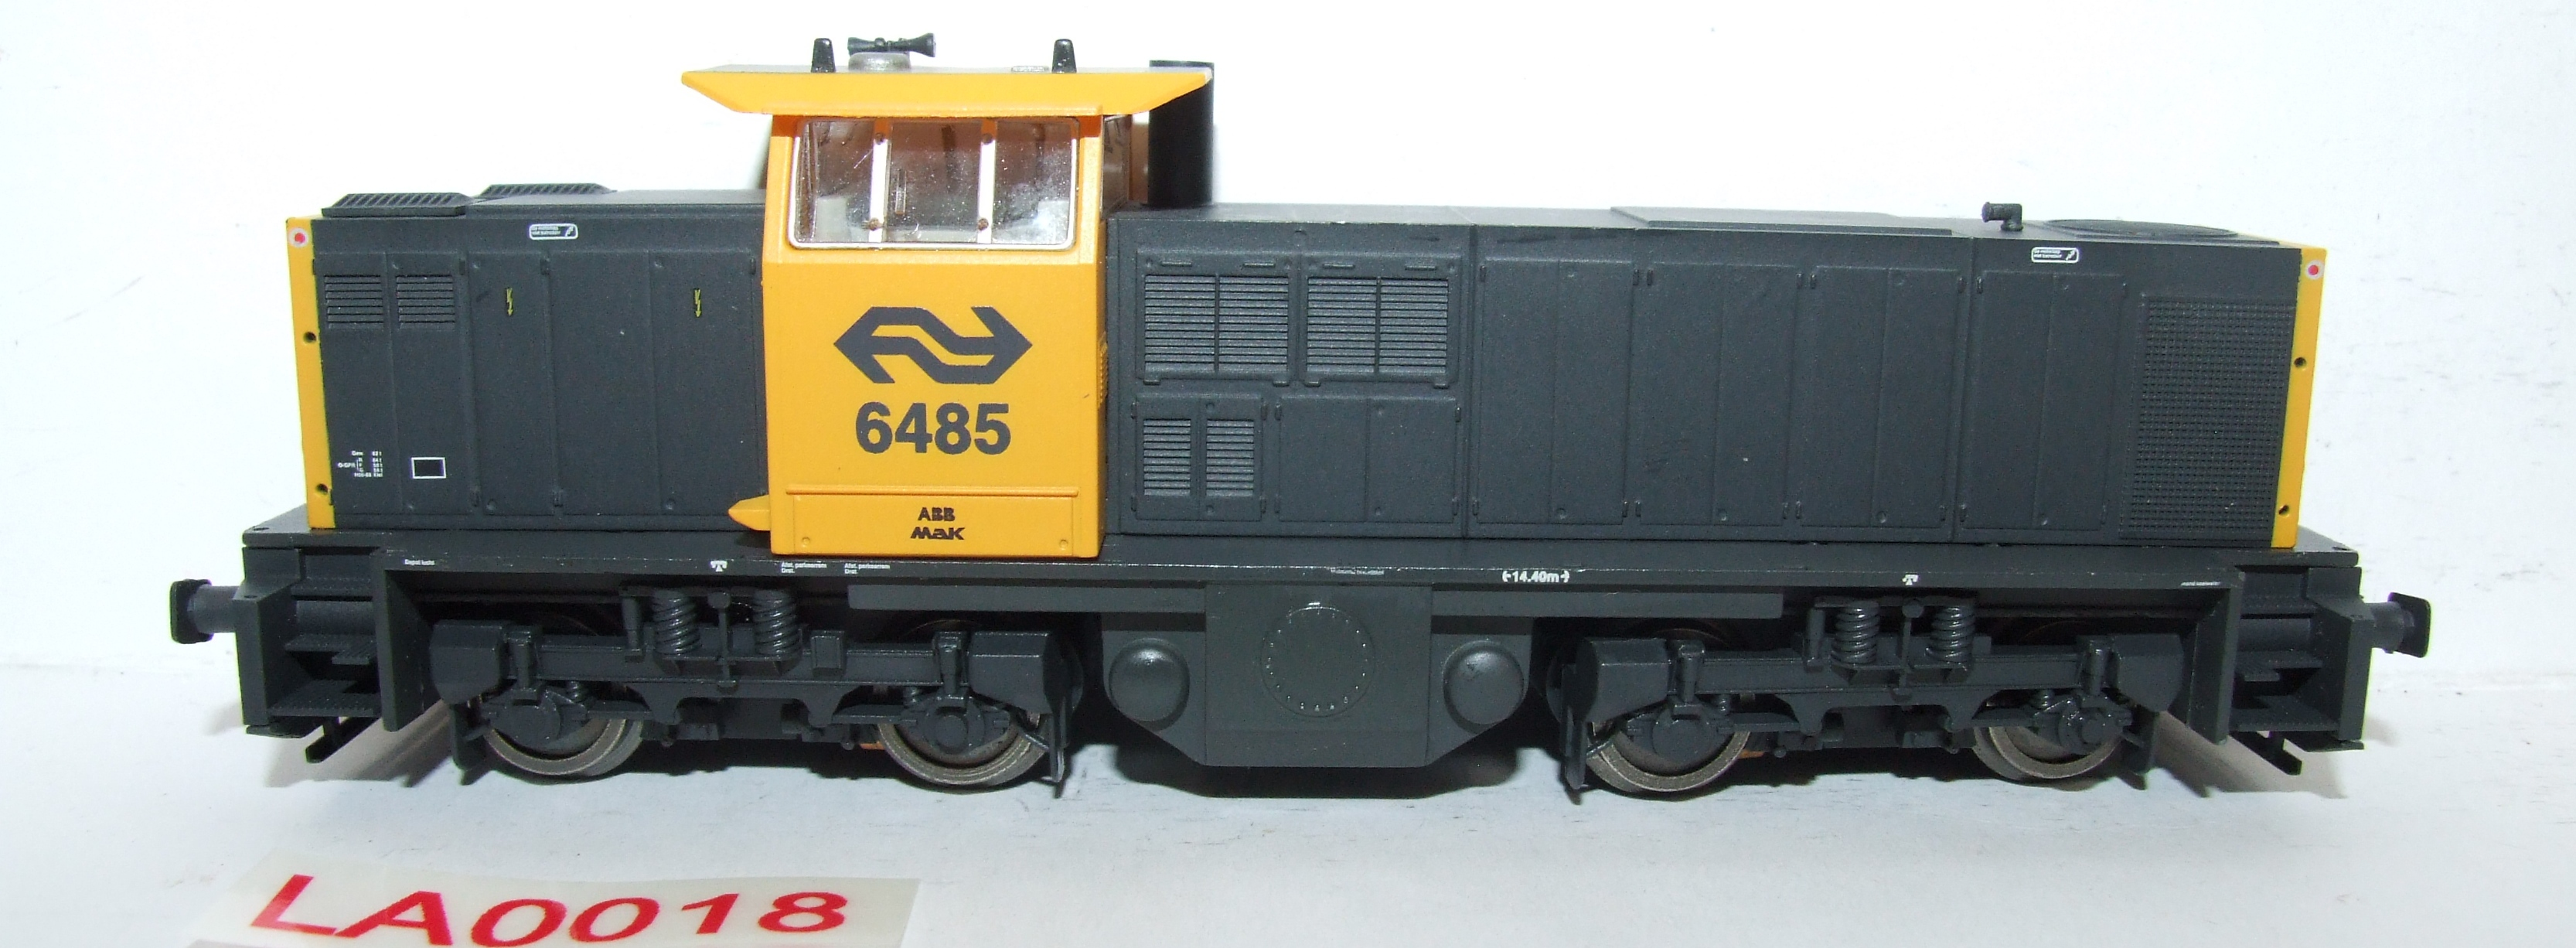 LA0018 Liliput H0 L 112408 Diesellok MAK NS 6485 DC in OVP